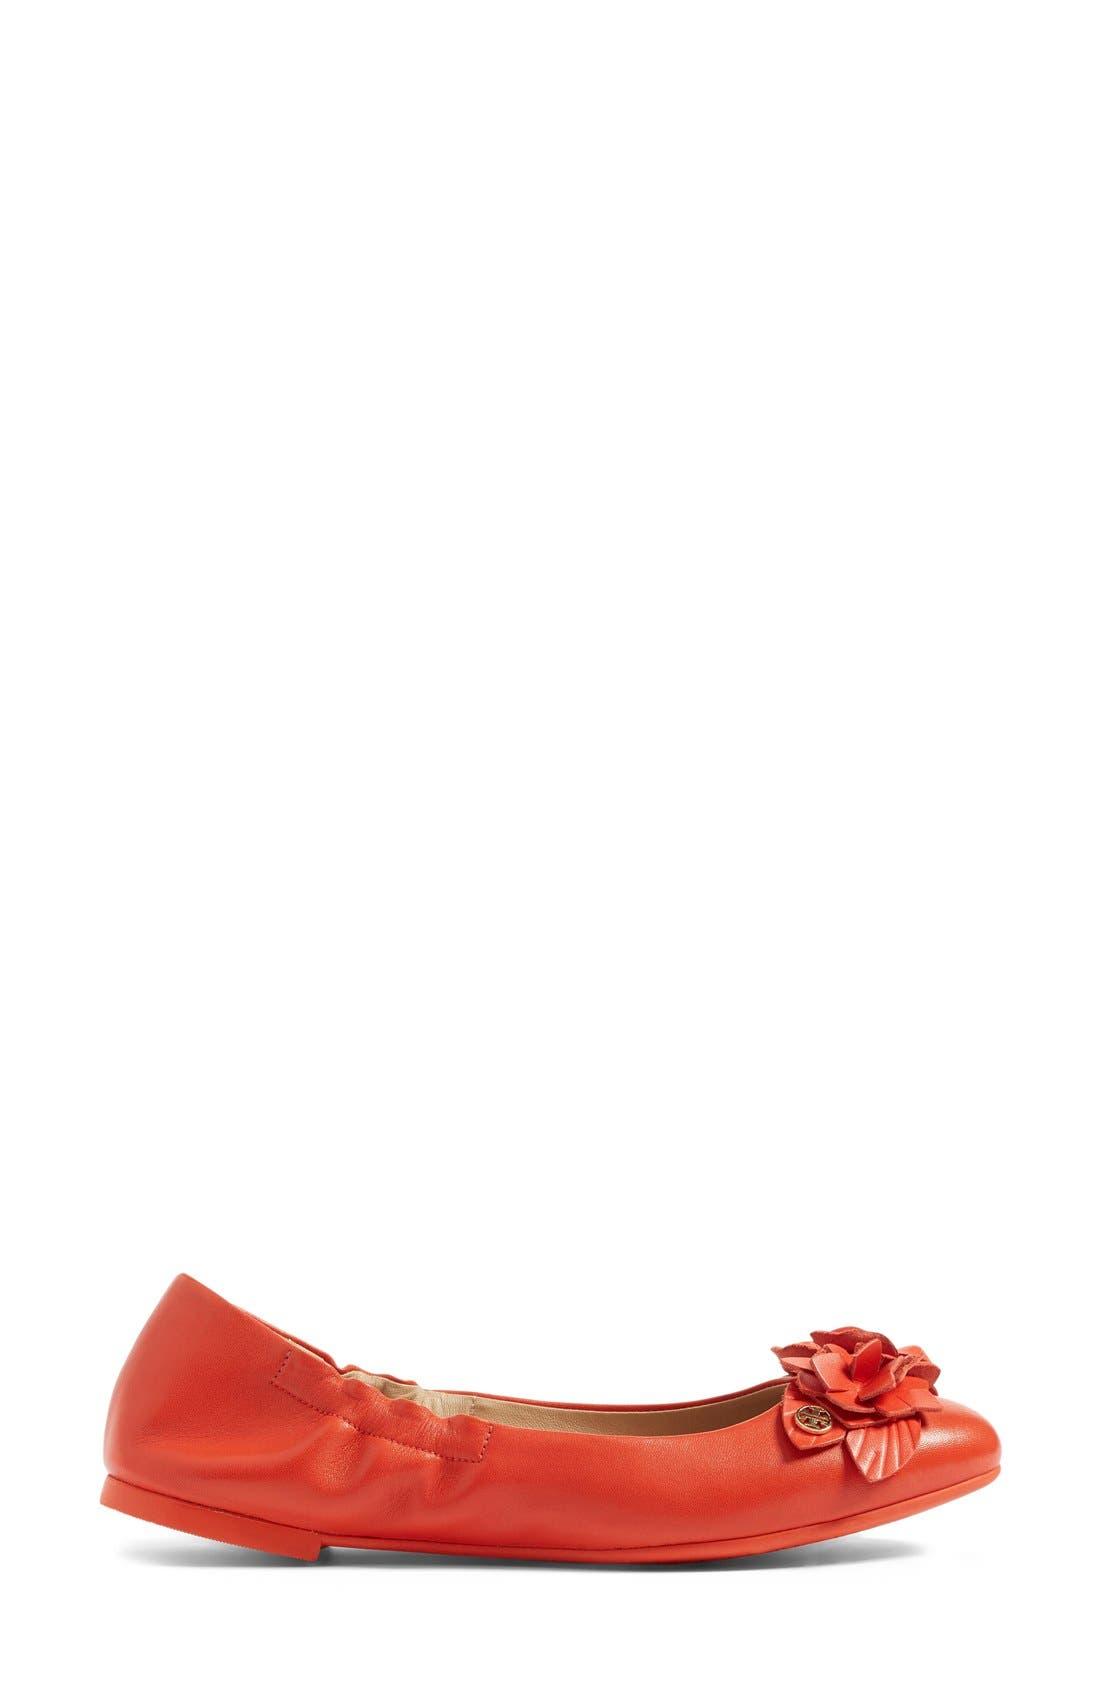 Alternate Image 4  - Tory Burch 'Blossom' Ballet Flat (Women)